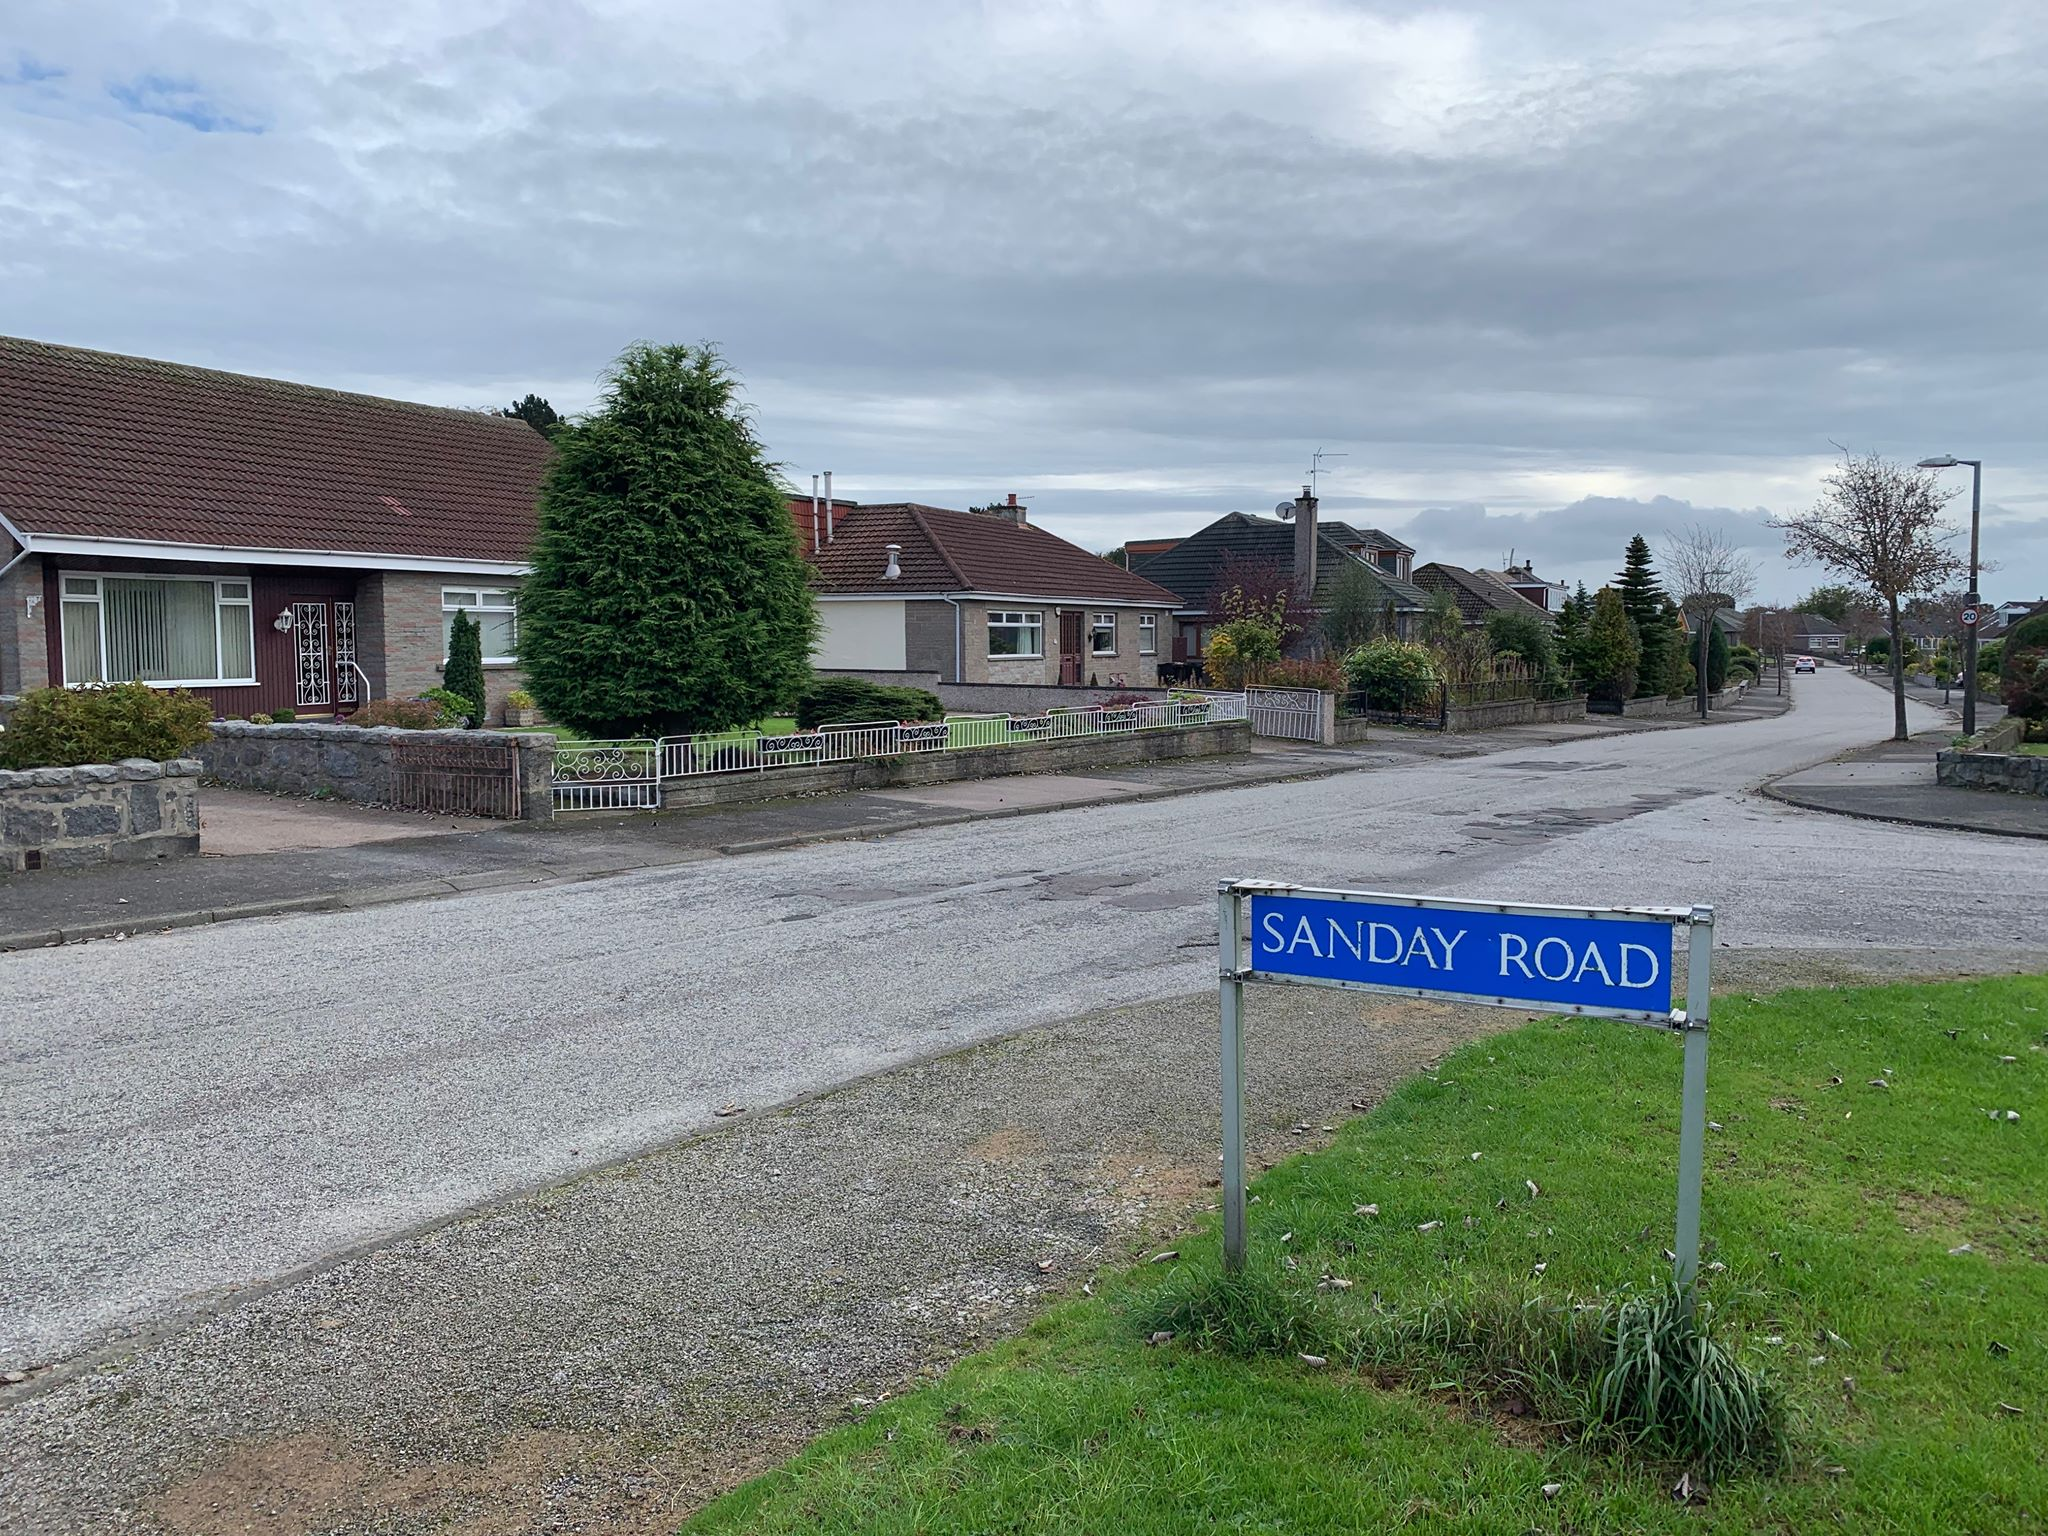 Sanday Road